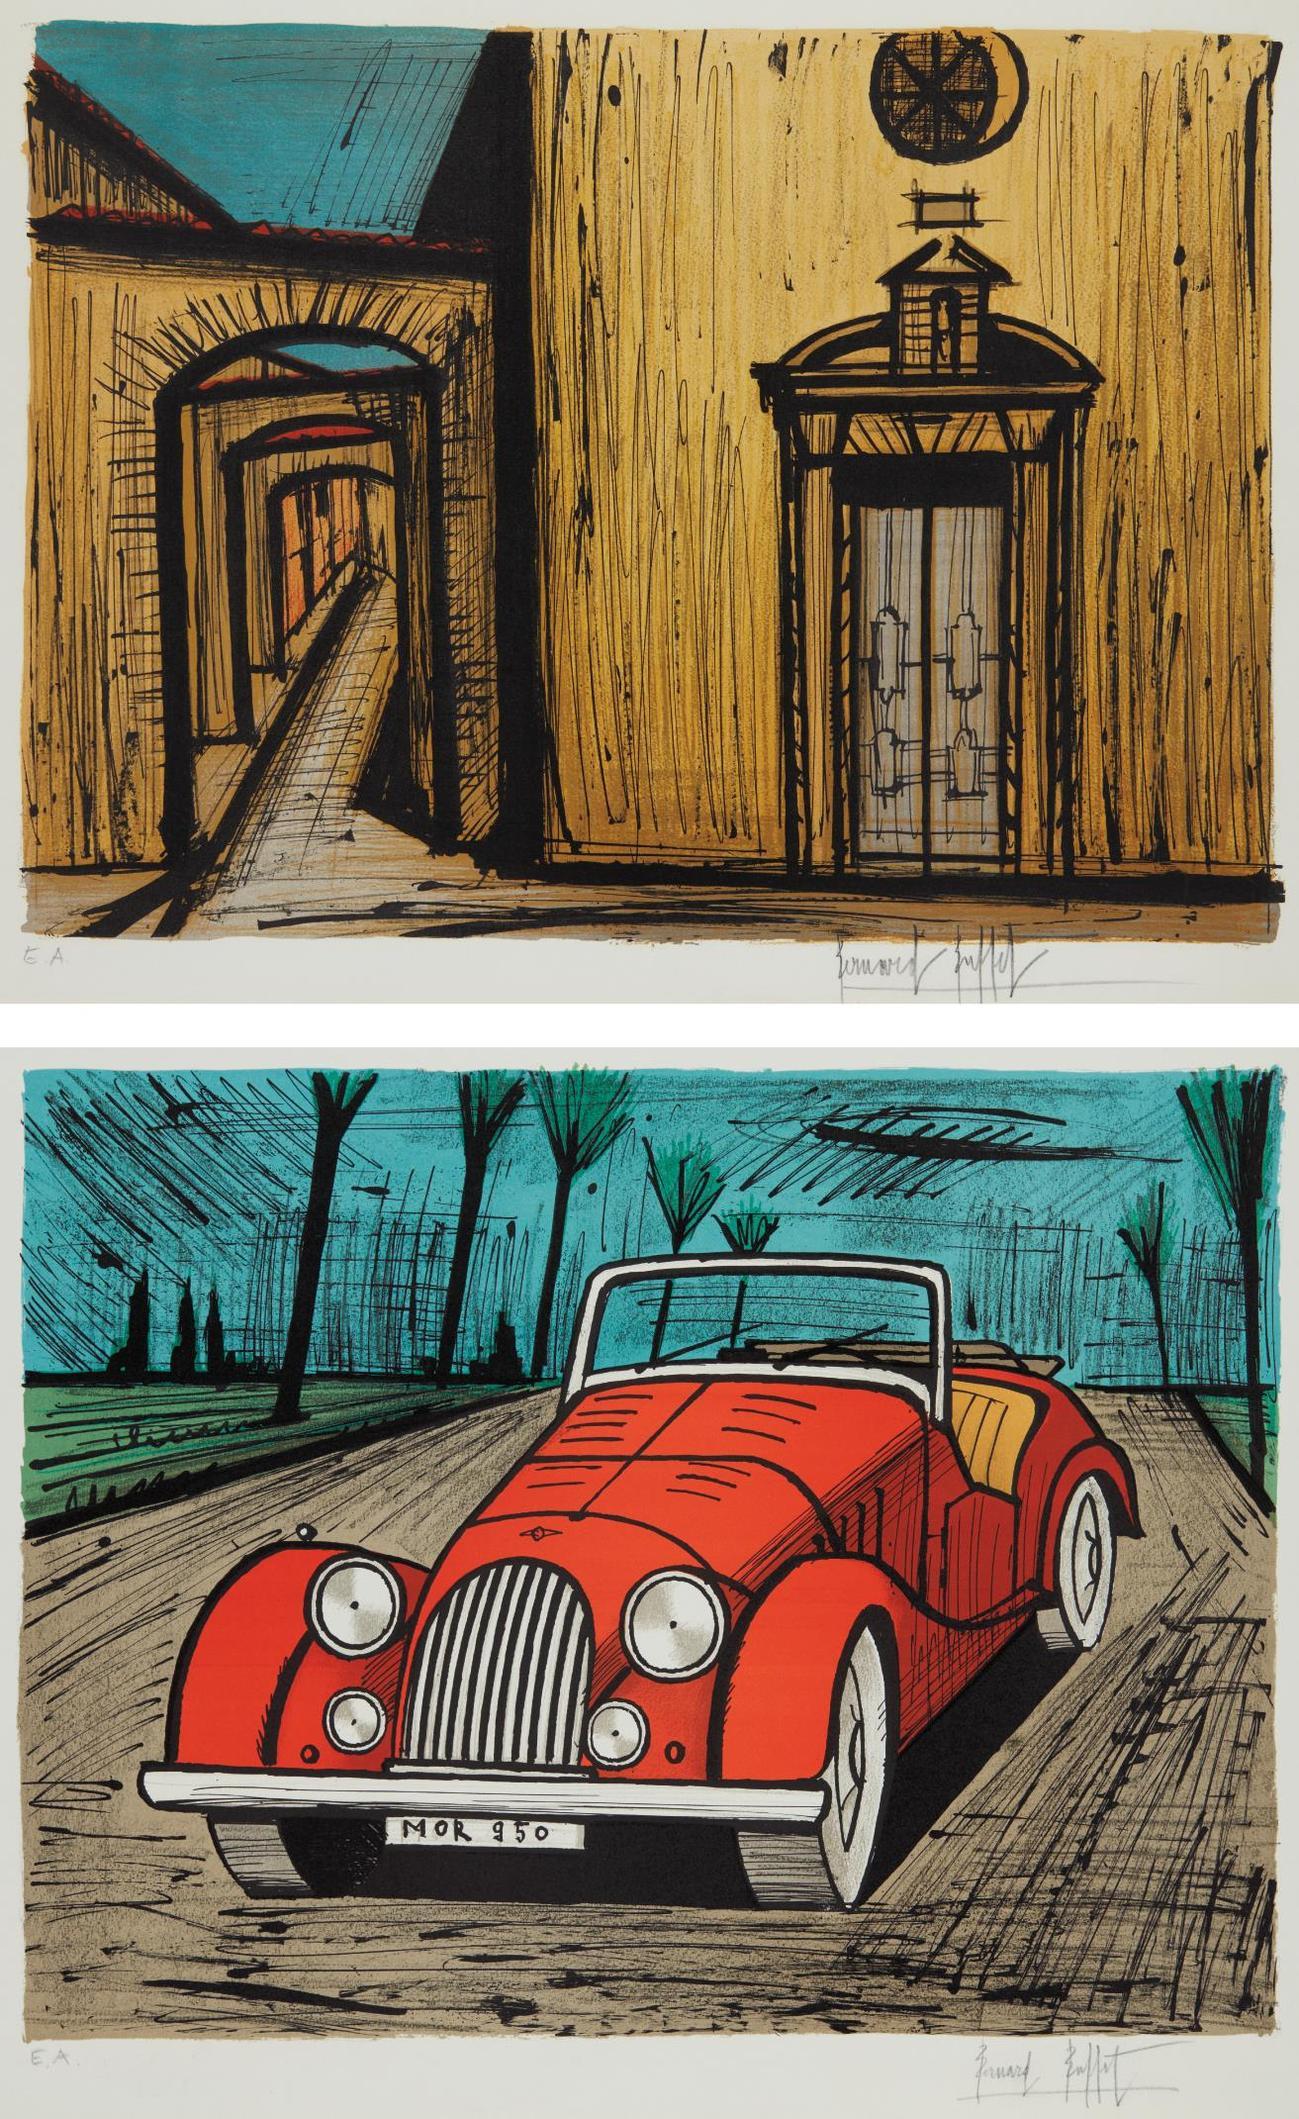 Bernard Buffet-La Rue Et Leglise De La Misericorde (The Street And The Church Of Mercy), From St. Tropez; And Morgan-1985